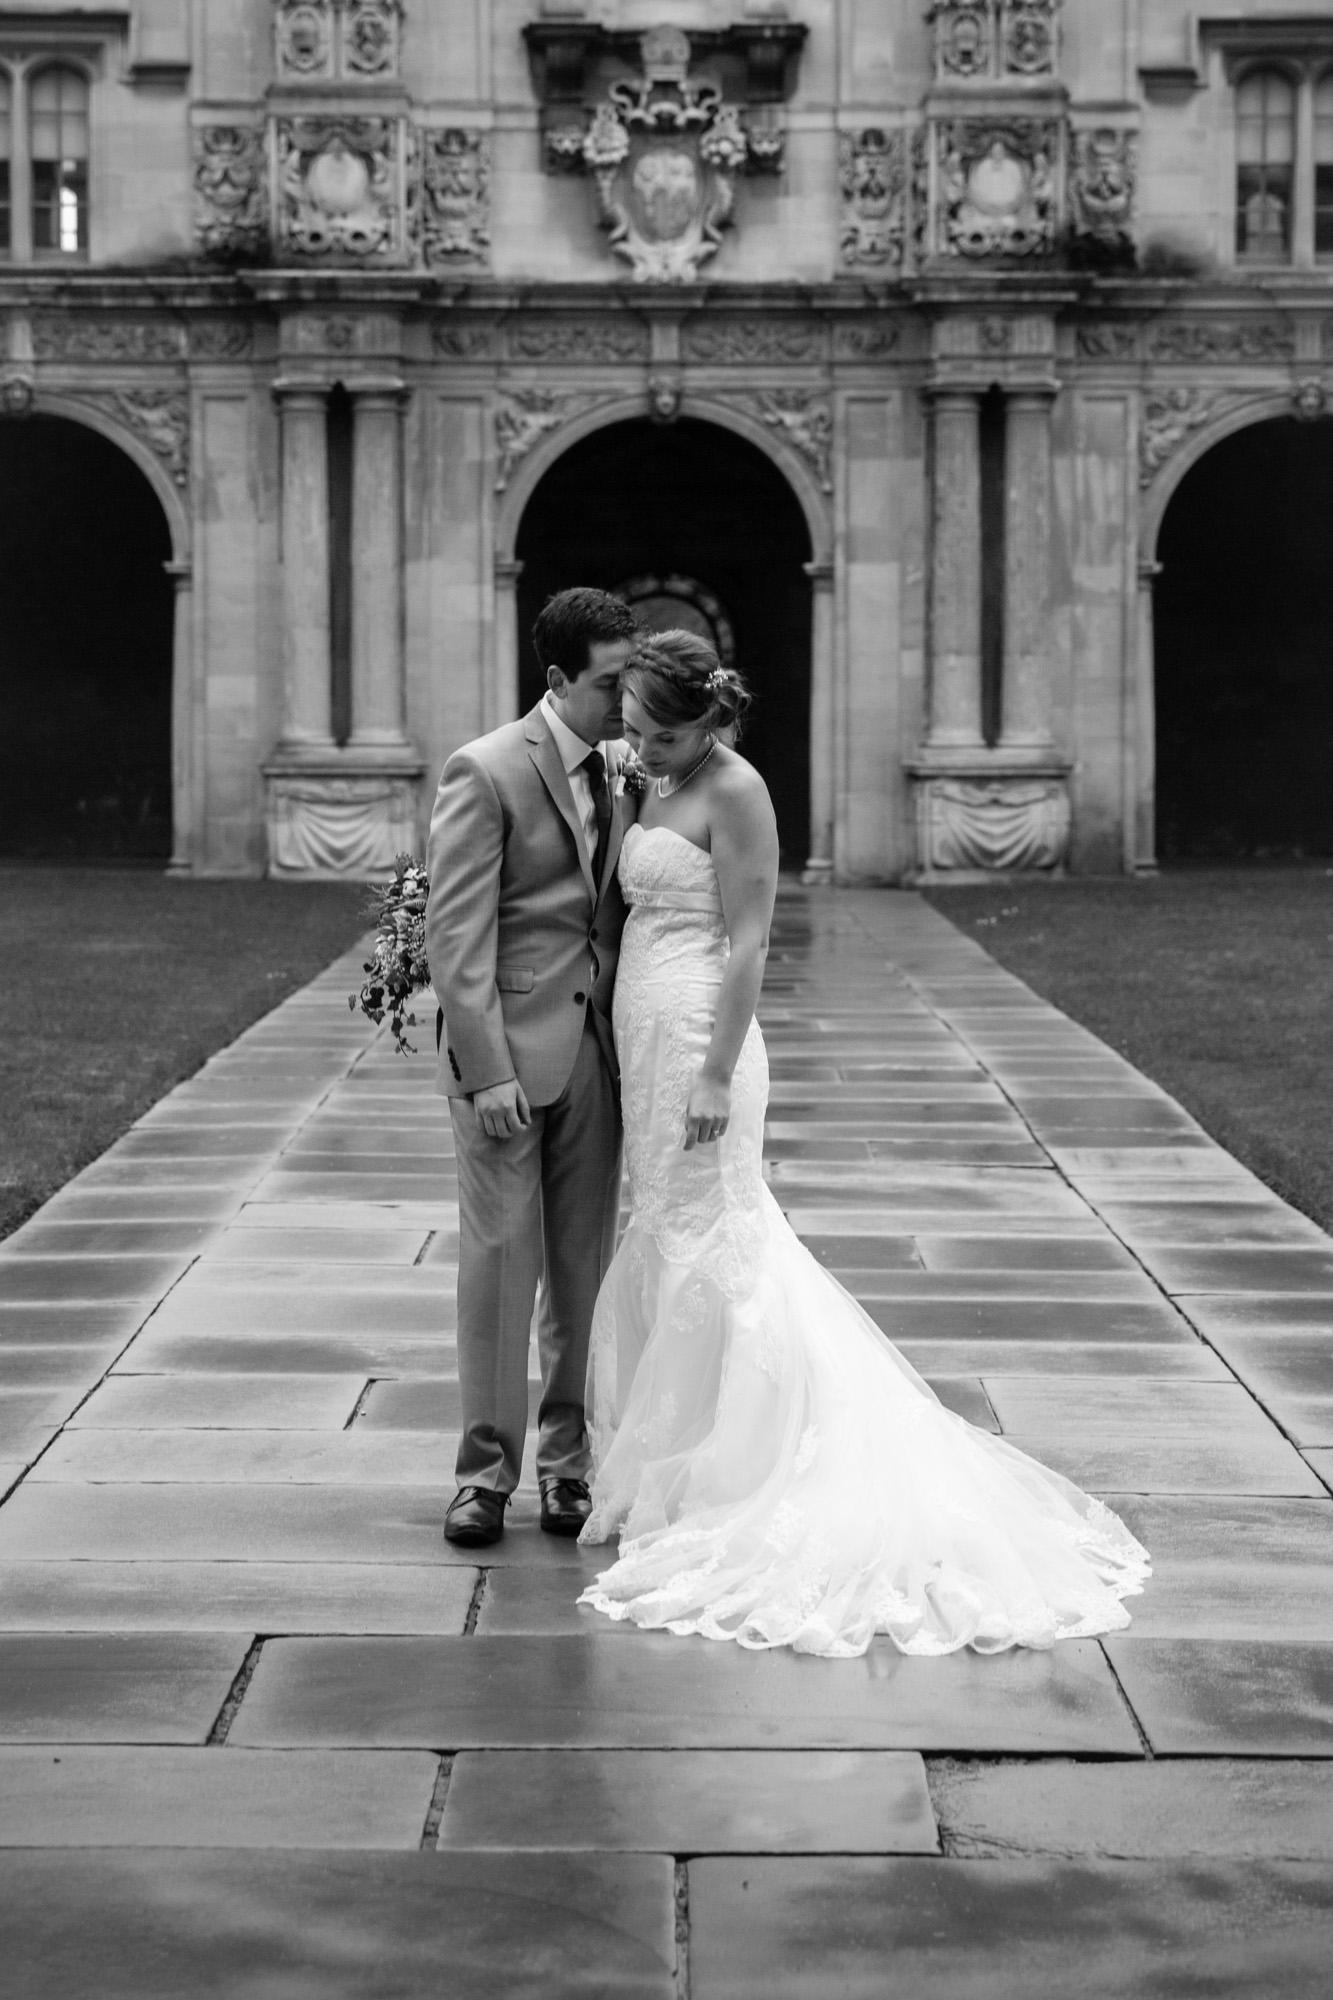 weddings-couples-love-photographer-oxford-london-jonathan-self-photography-87.jpg